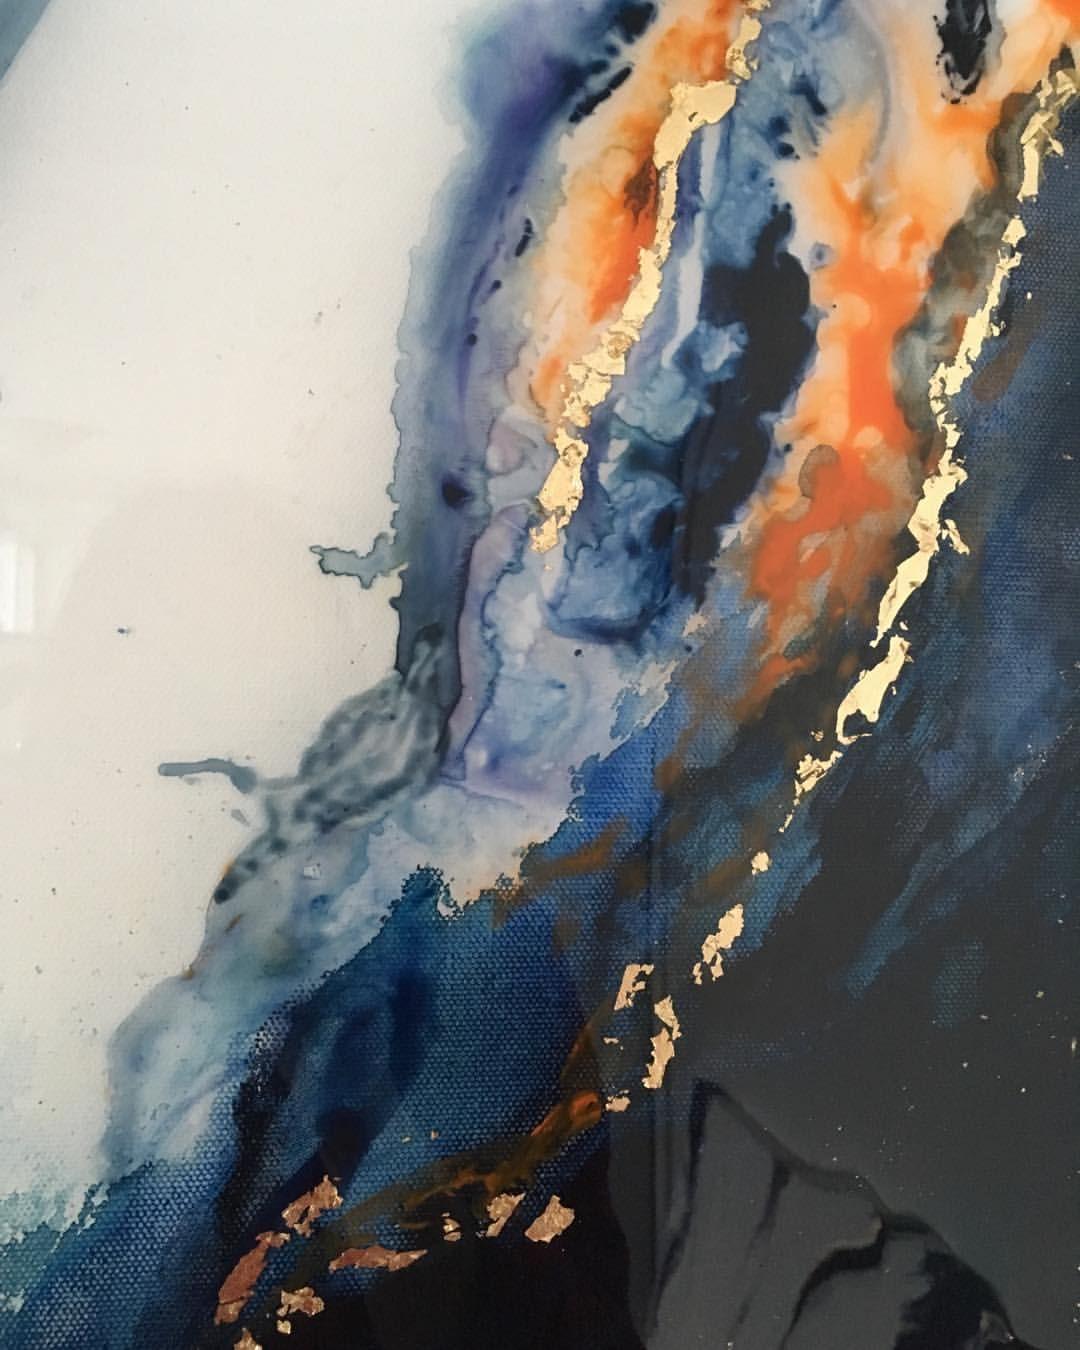 Nicole Sonneson On Instagram Navy And Orange Resin Painting Up Close Details Resinart Resin Artresin Watercolor Gold Navy In 2020 Resin Painting Painting Orange Art